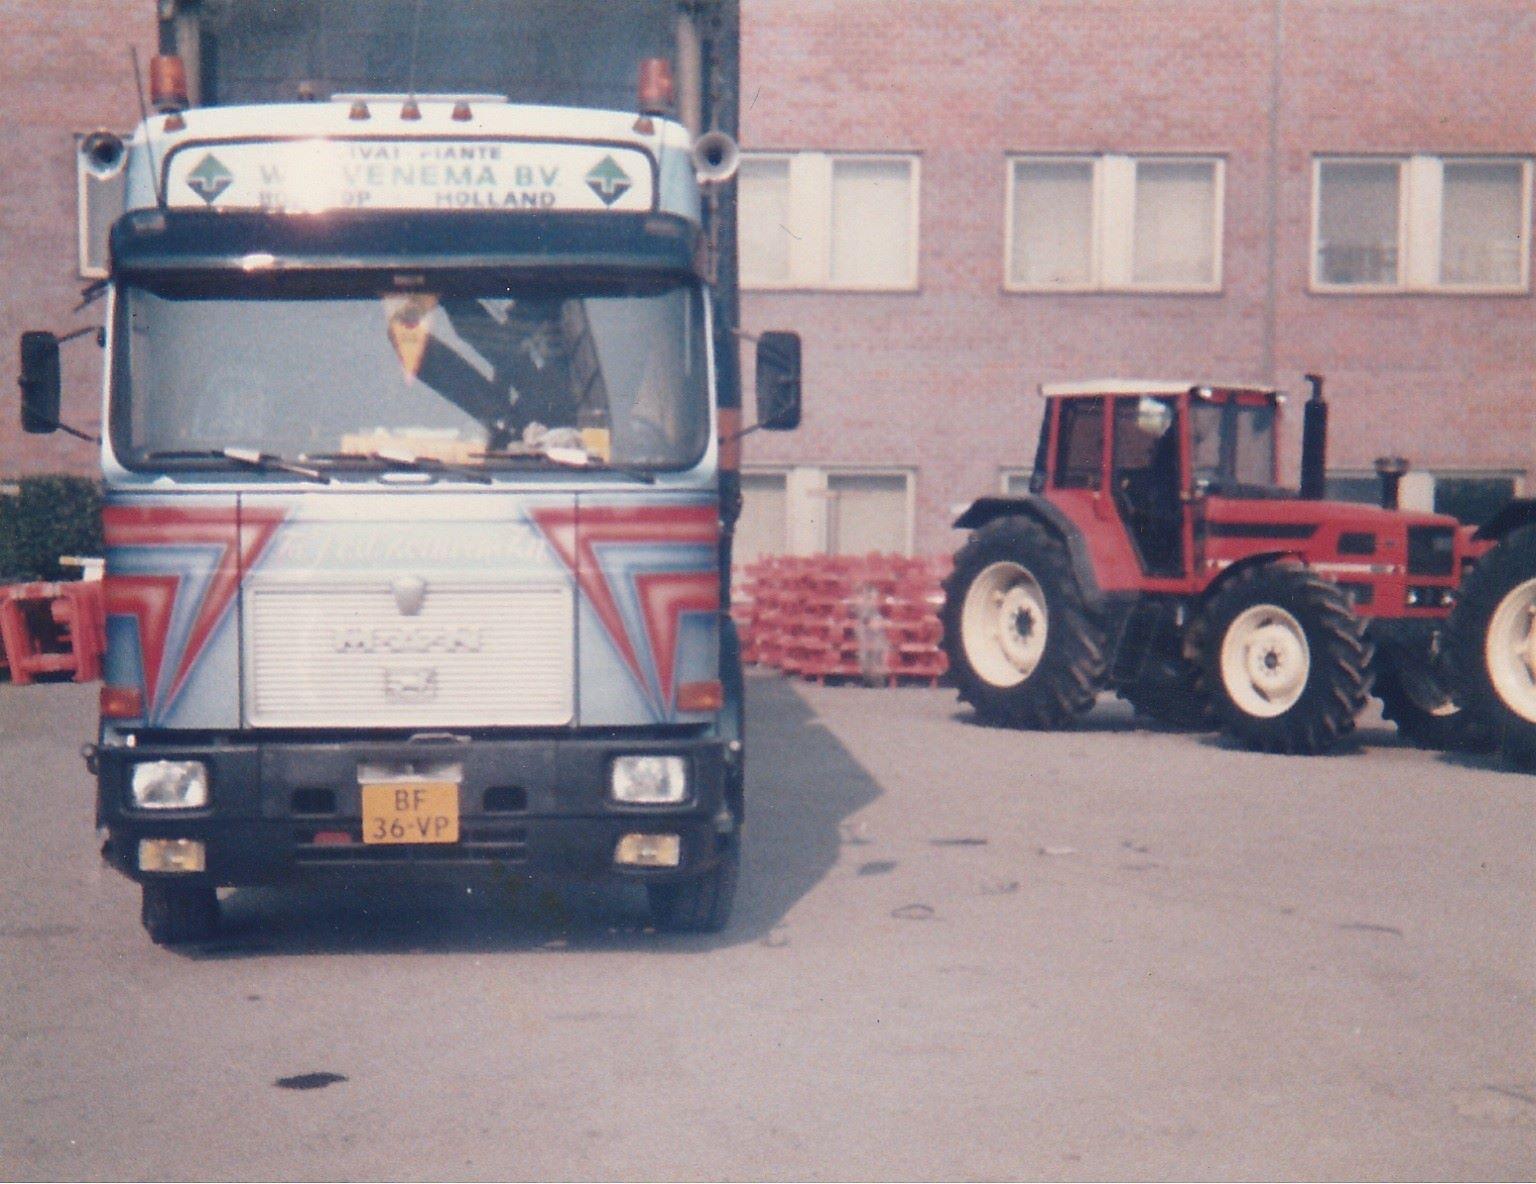 Bas-van-der-Zouwen-foto-archief-(39)